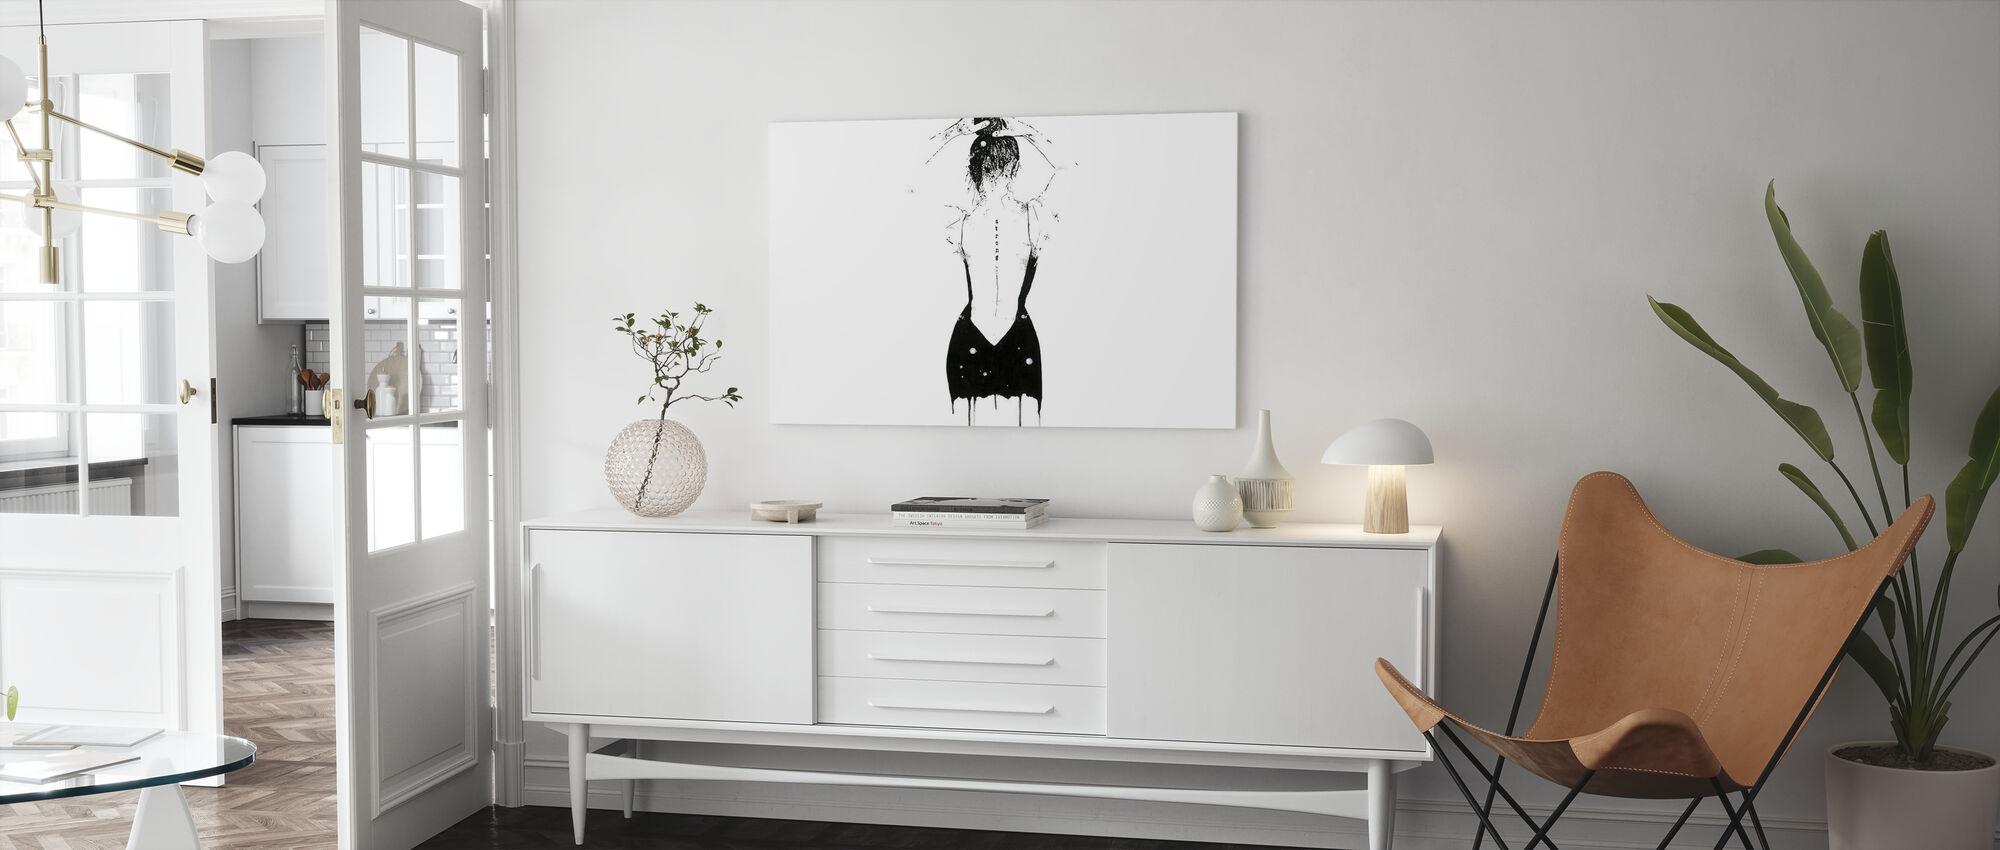 Achiever - Canvas print - Living Room